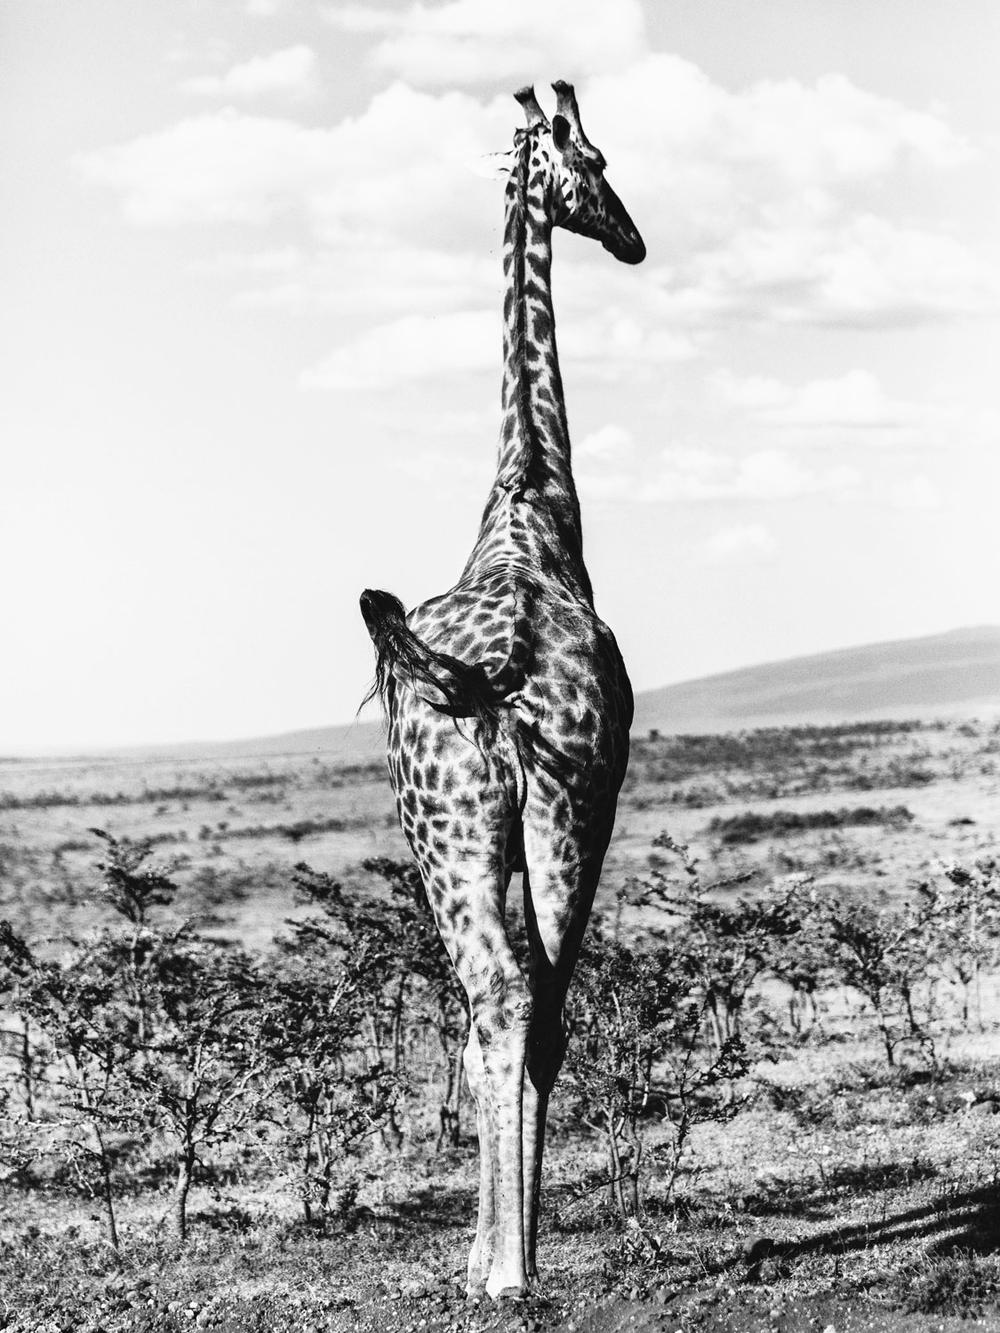 CallieGiovanna_Africa_Tanzania_Serengeti_20150101_08403.jpg